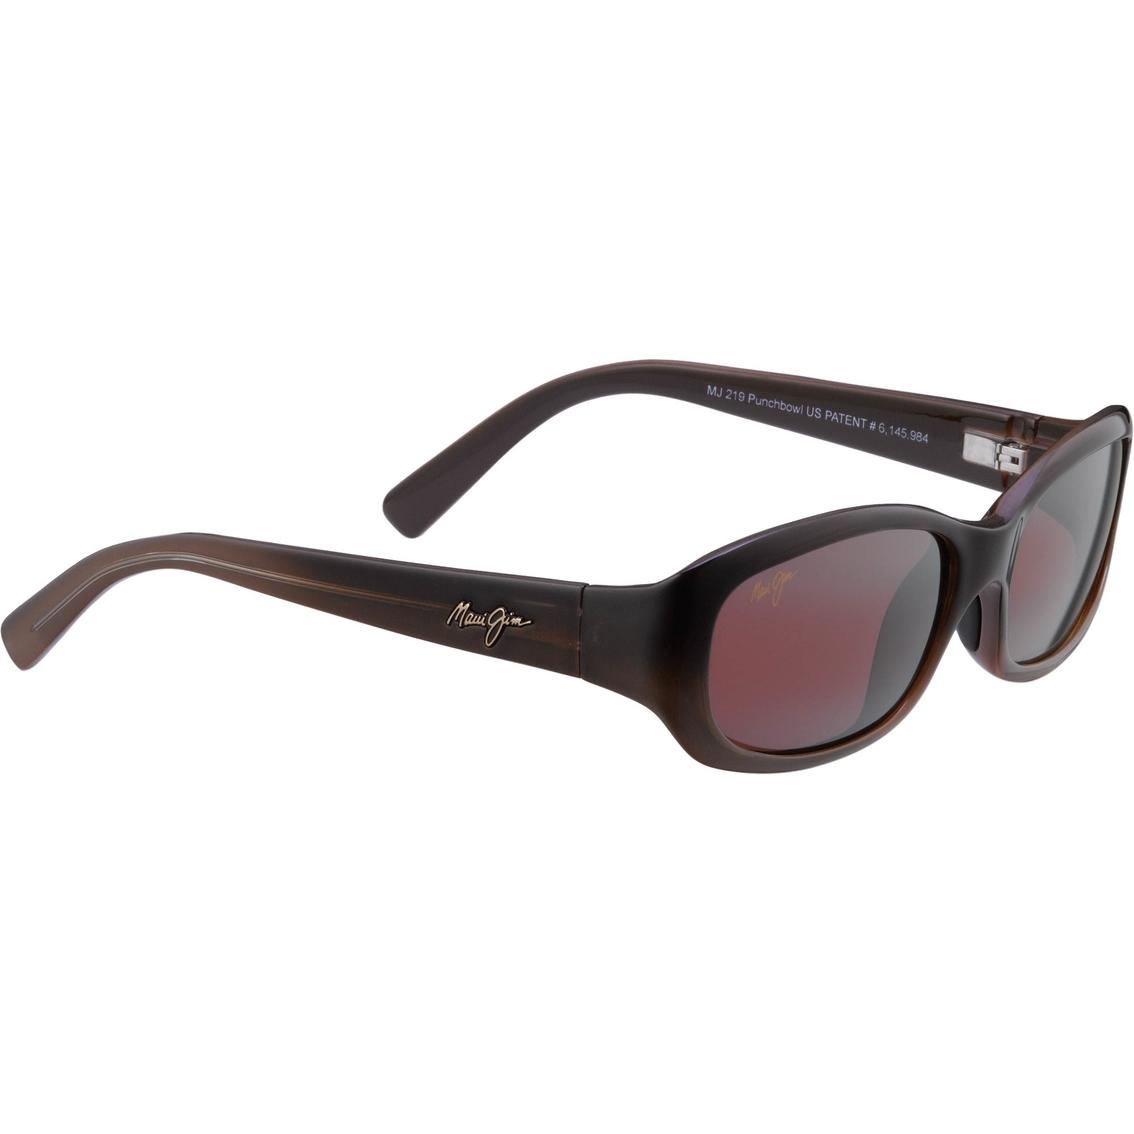 8570a3841a60a Maui Jim Punchbowl Sunglasses